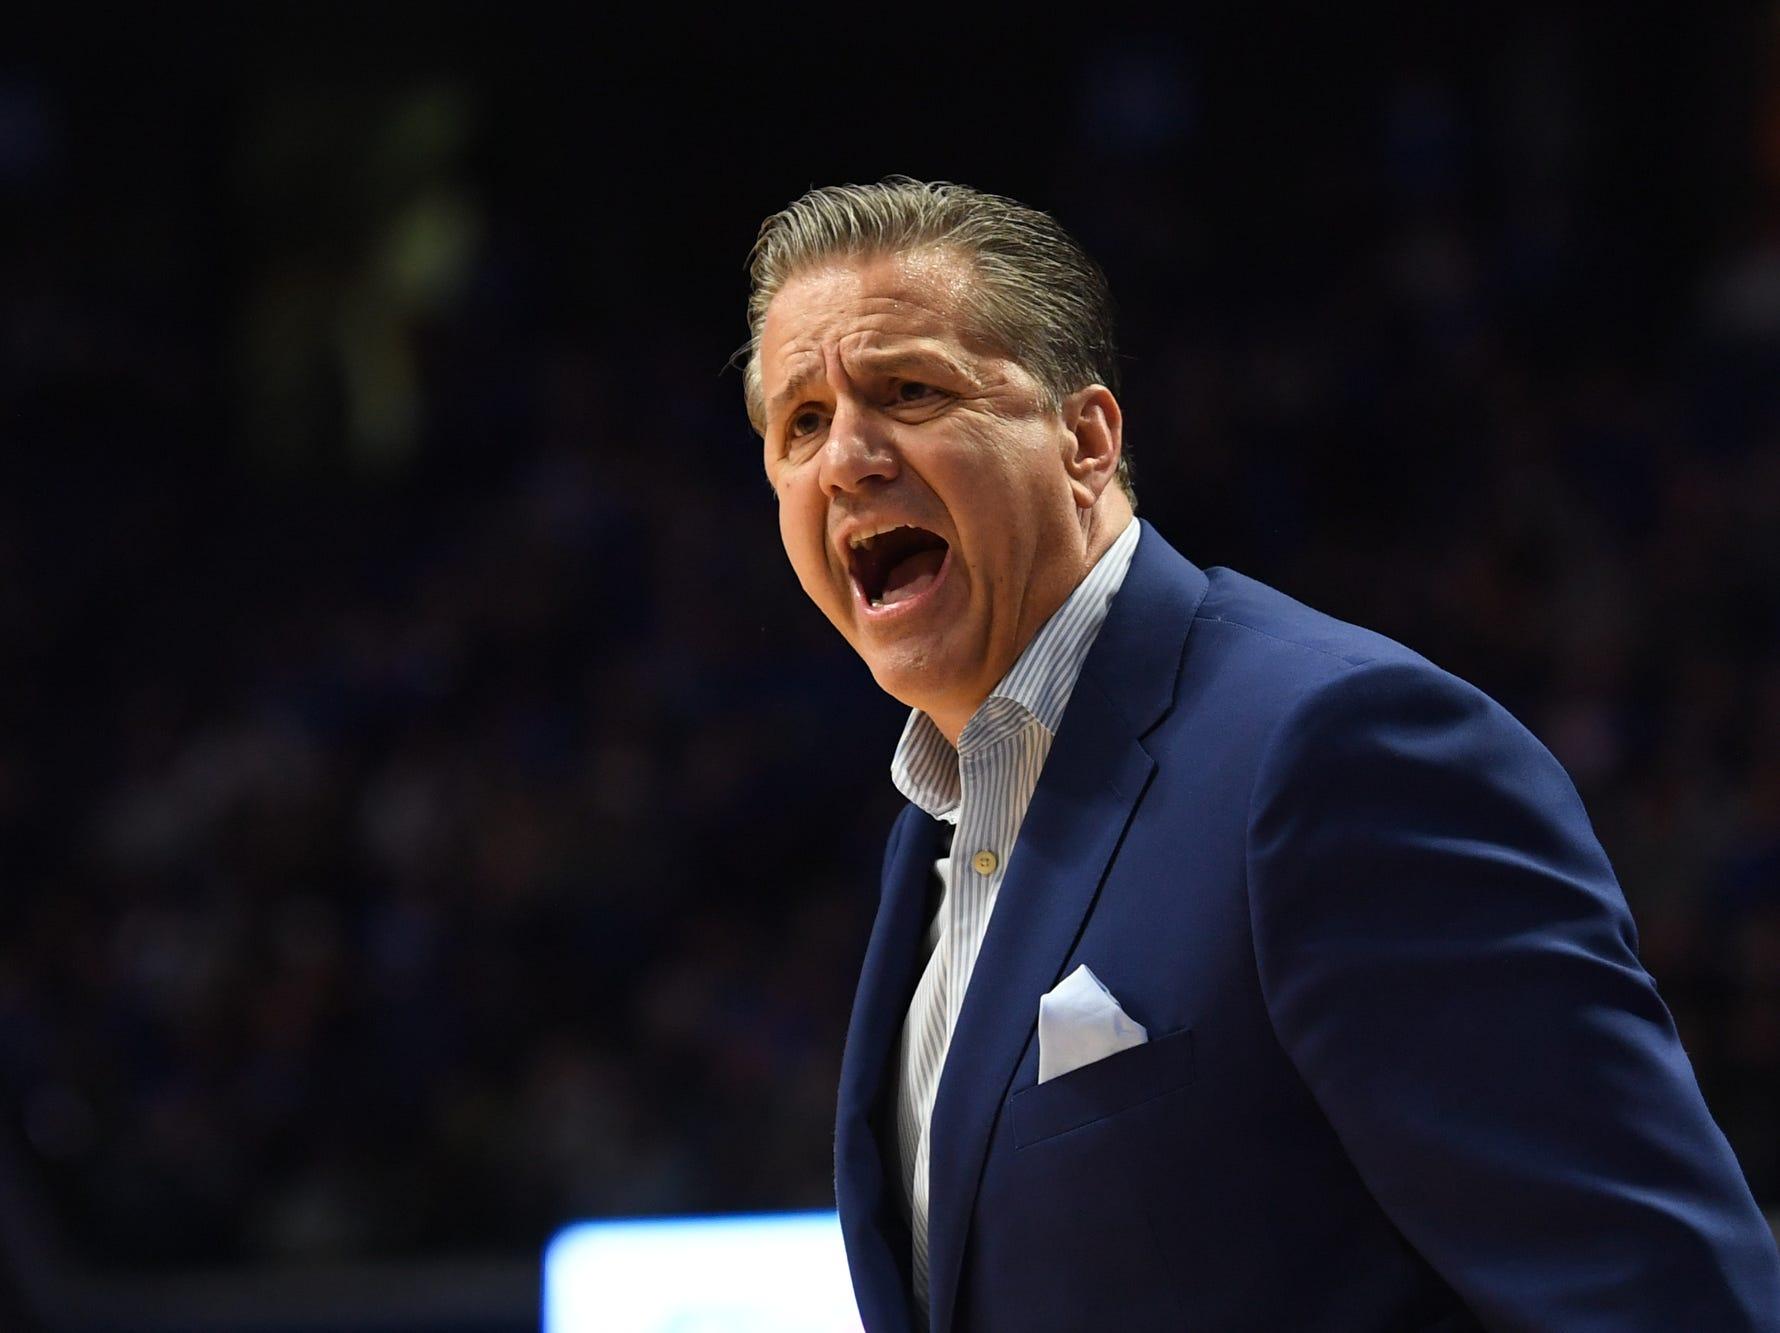 UK head coach John Calipari yells during the University of Kentucky  basketball game against Indiana University of Pennsylvania at Rupp Arena on Nov. 2, 2018.